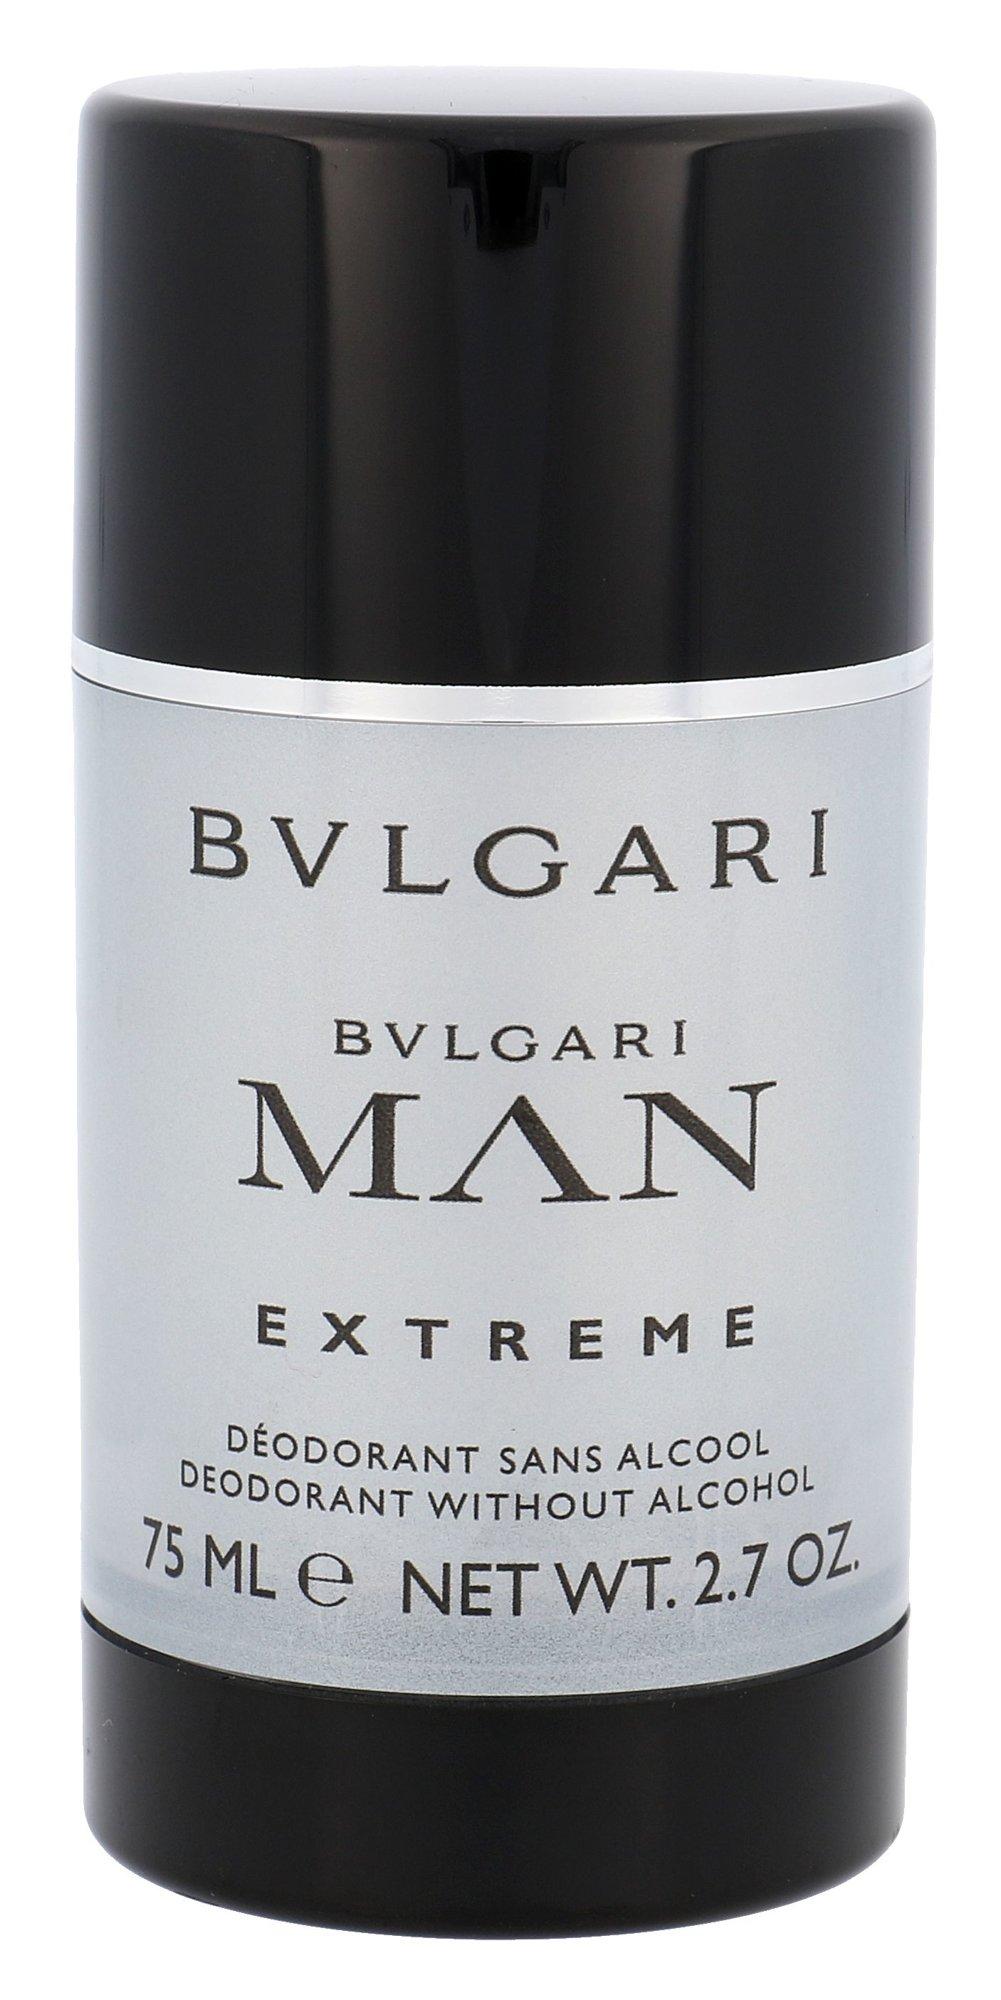 Bvlgari Bvlgari Man Extreme Deostick 75ml